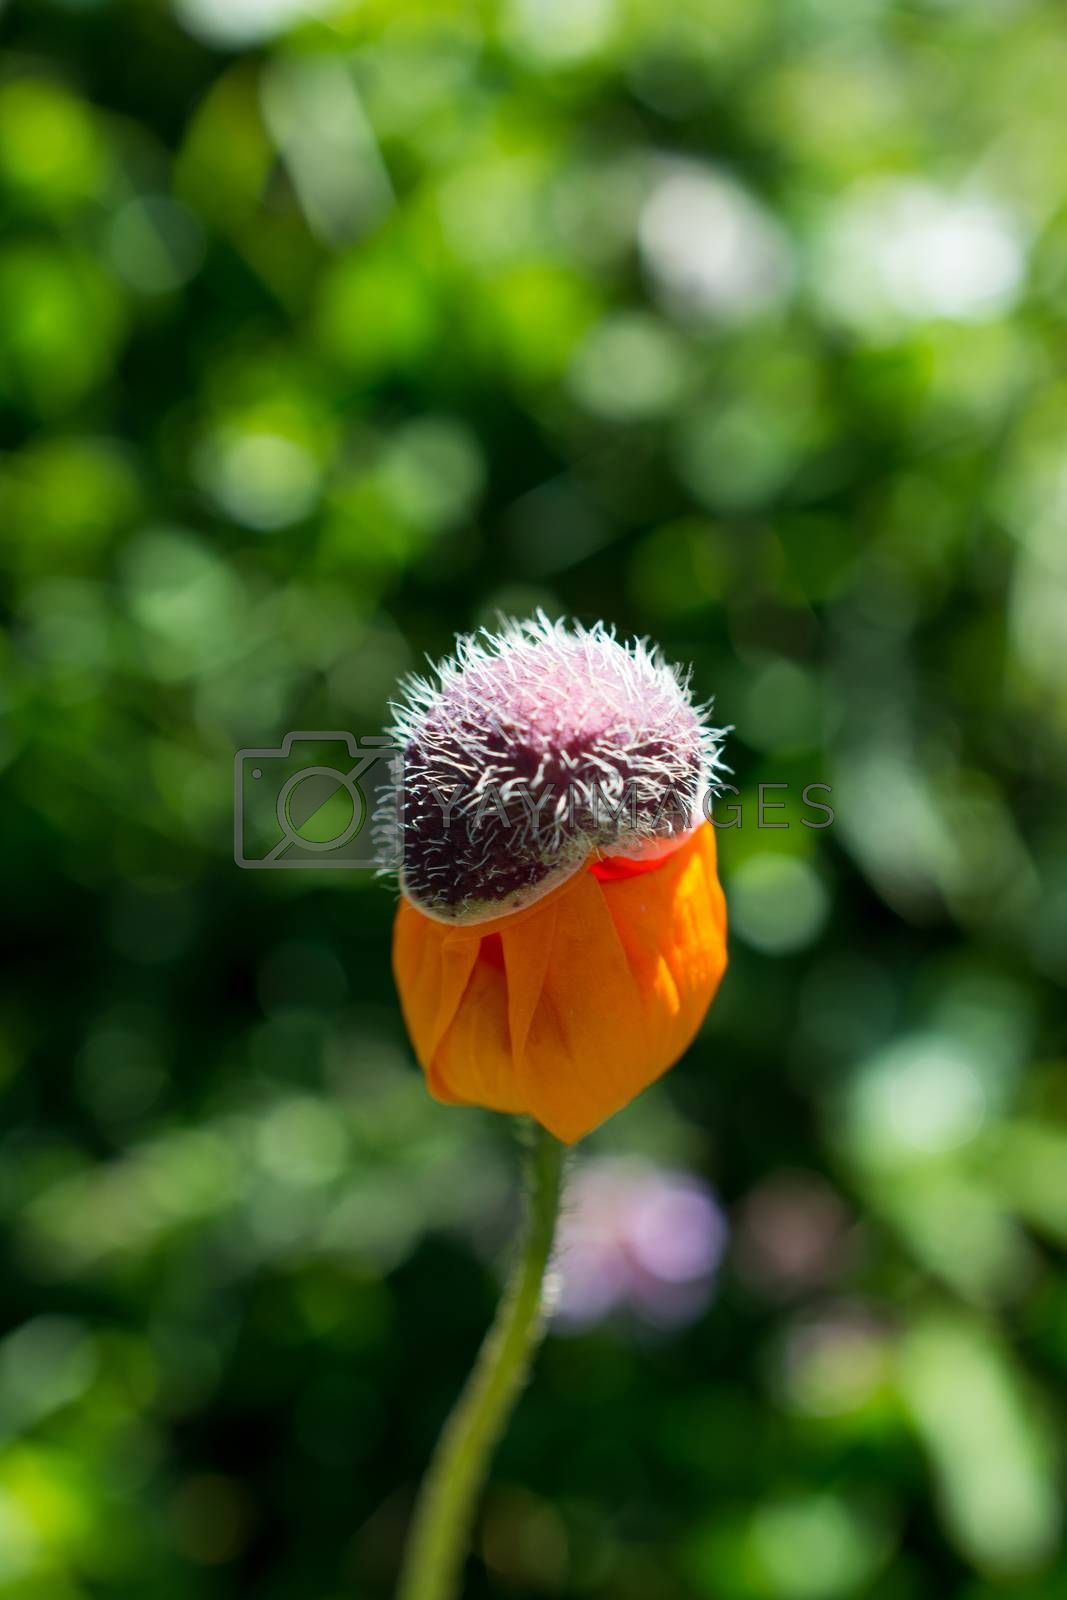 Beautiful Oriental poppy flowers in nature background